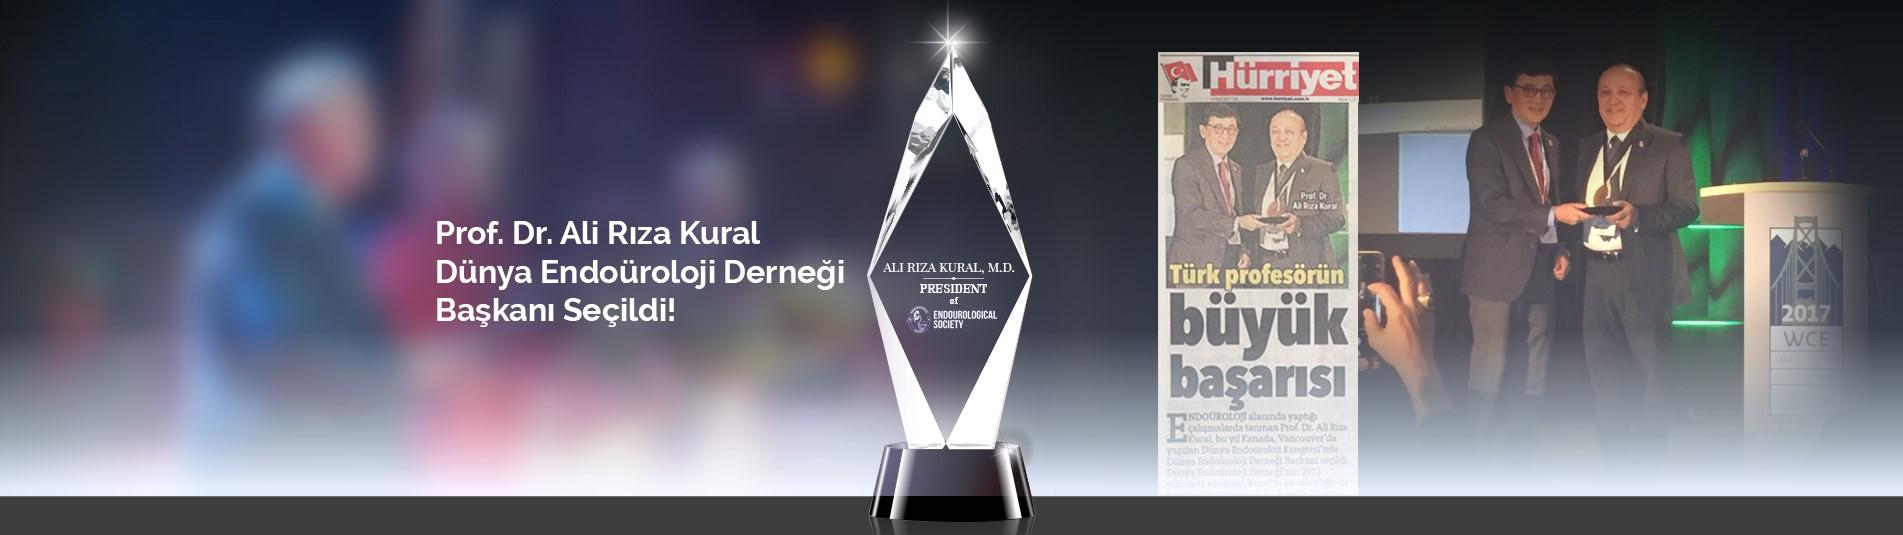 Prof. Dr. Ali Rıza Kural